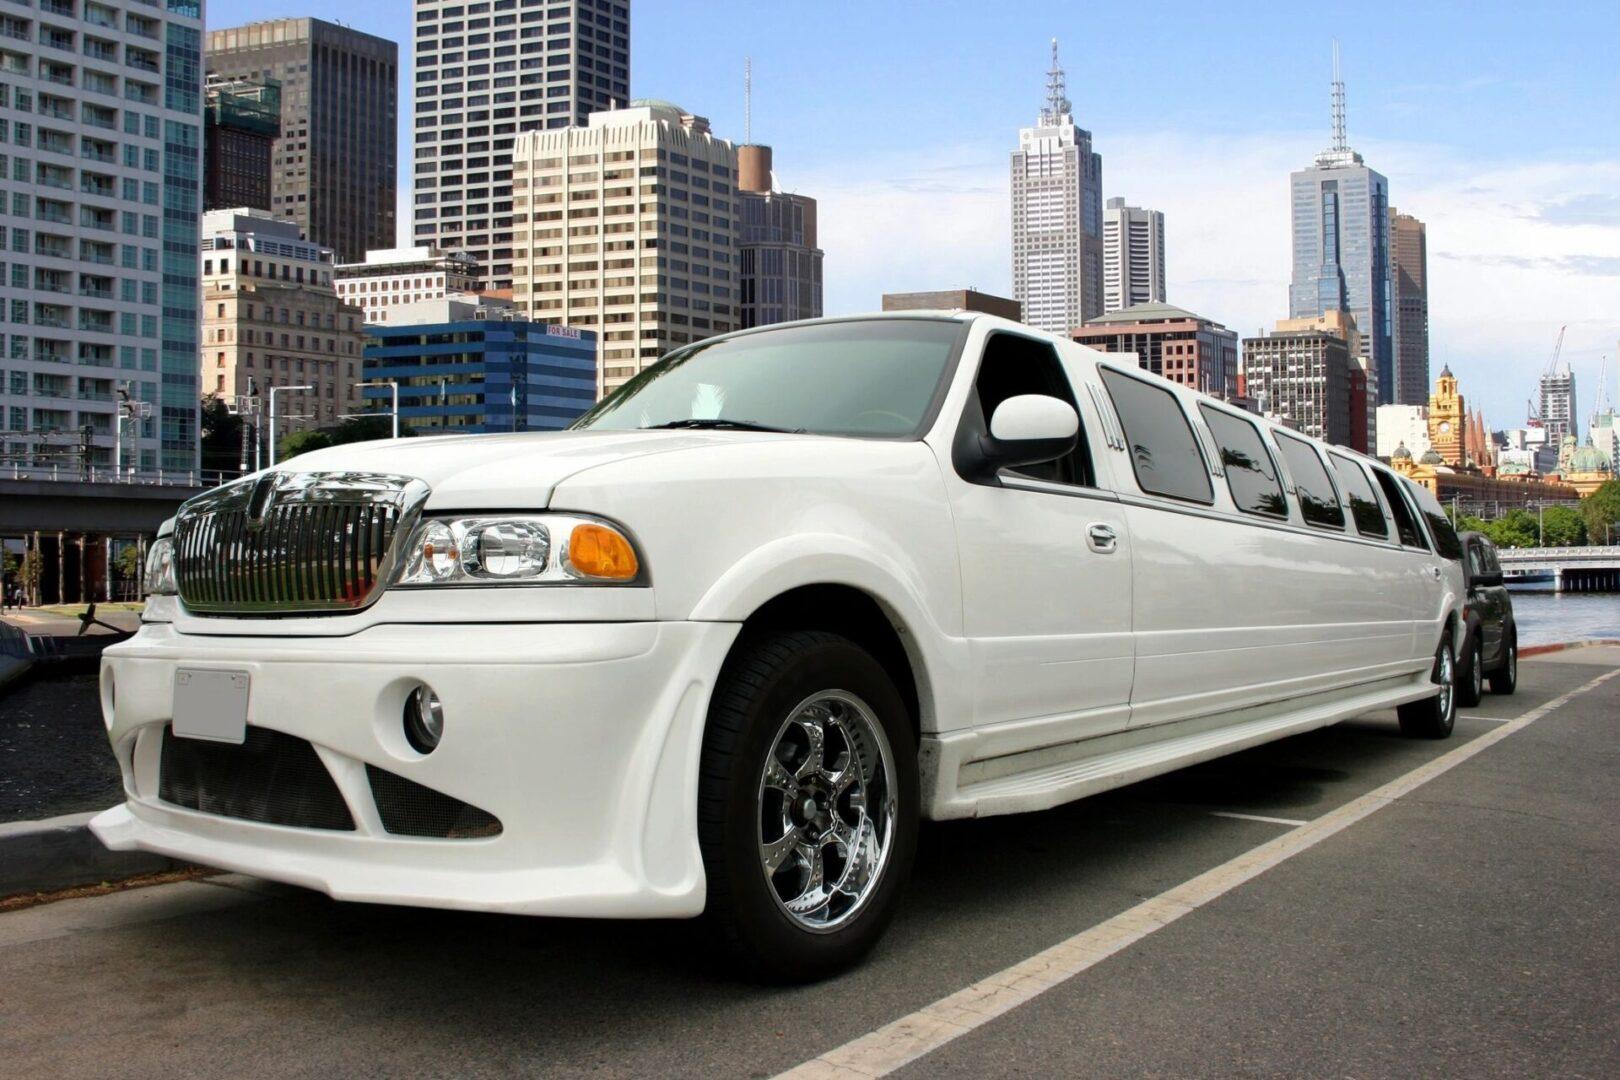 a white limousine